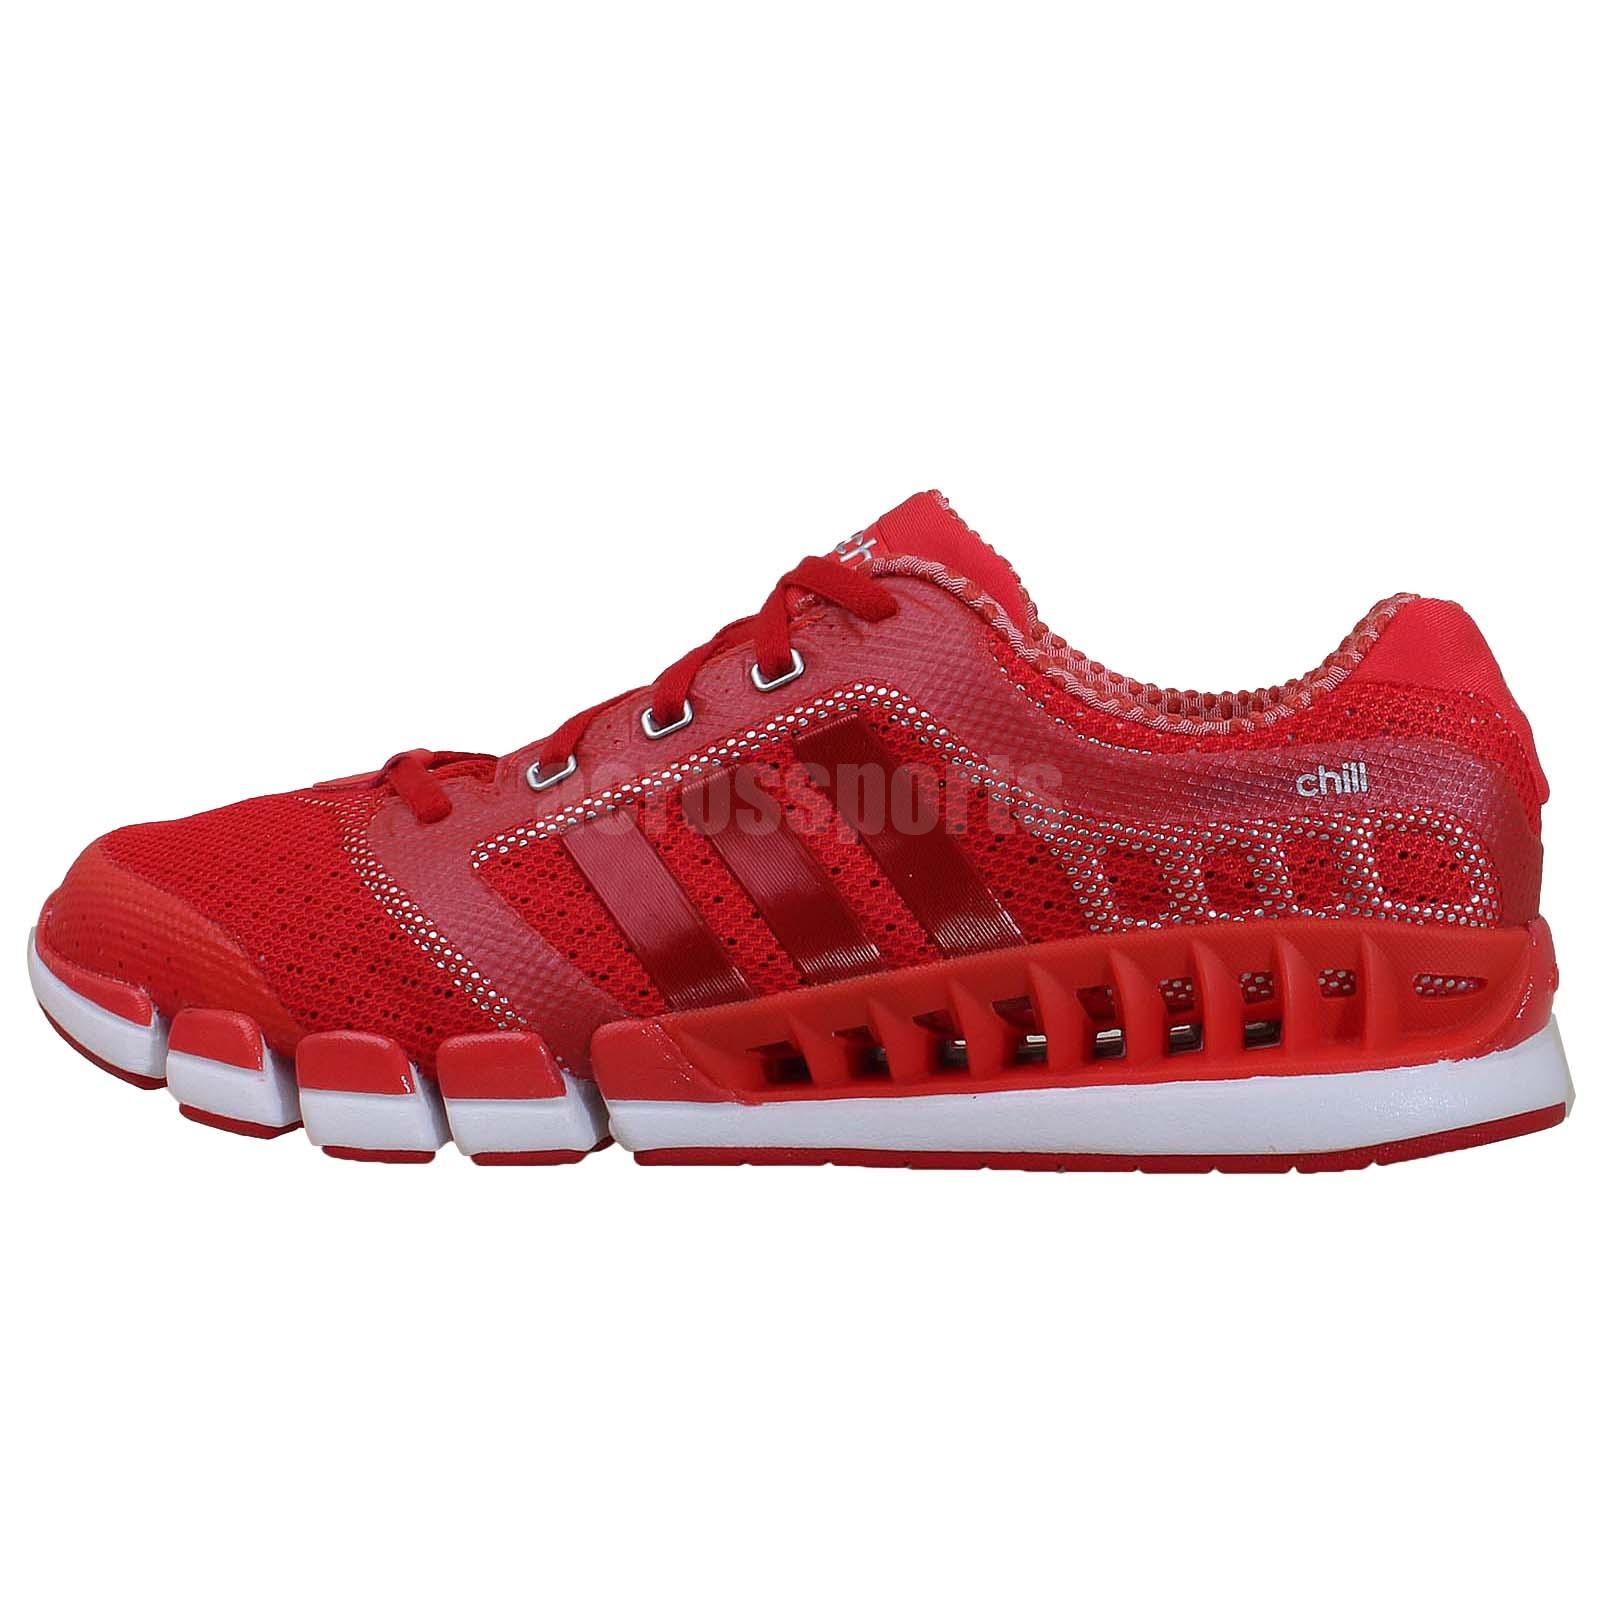 HG243125 Adidas Climacool Running WhiteBlackRed Ride Shoes